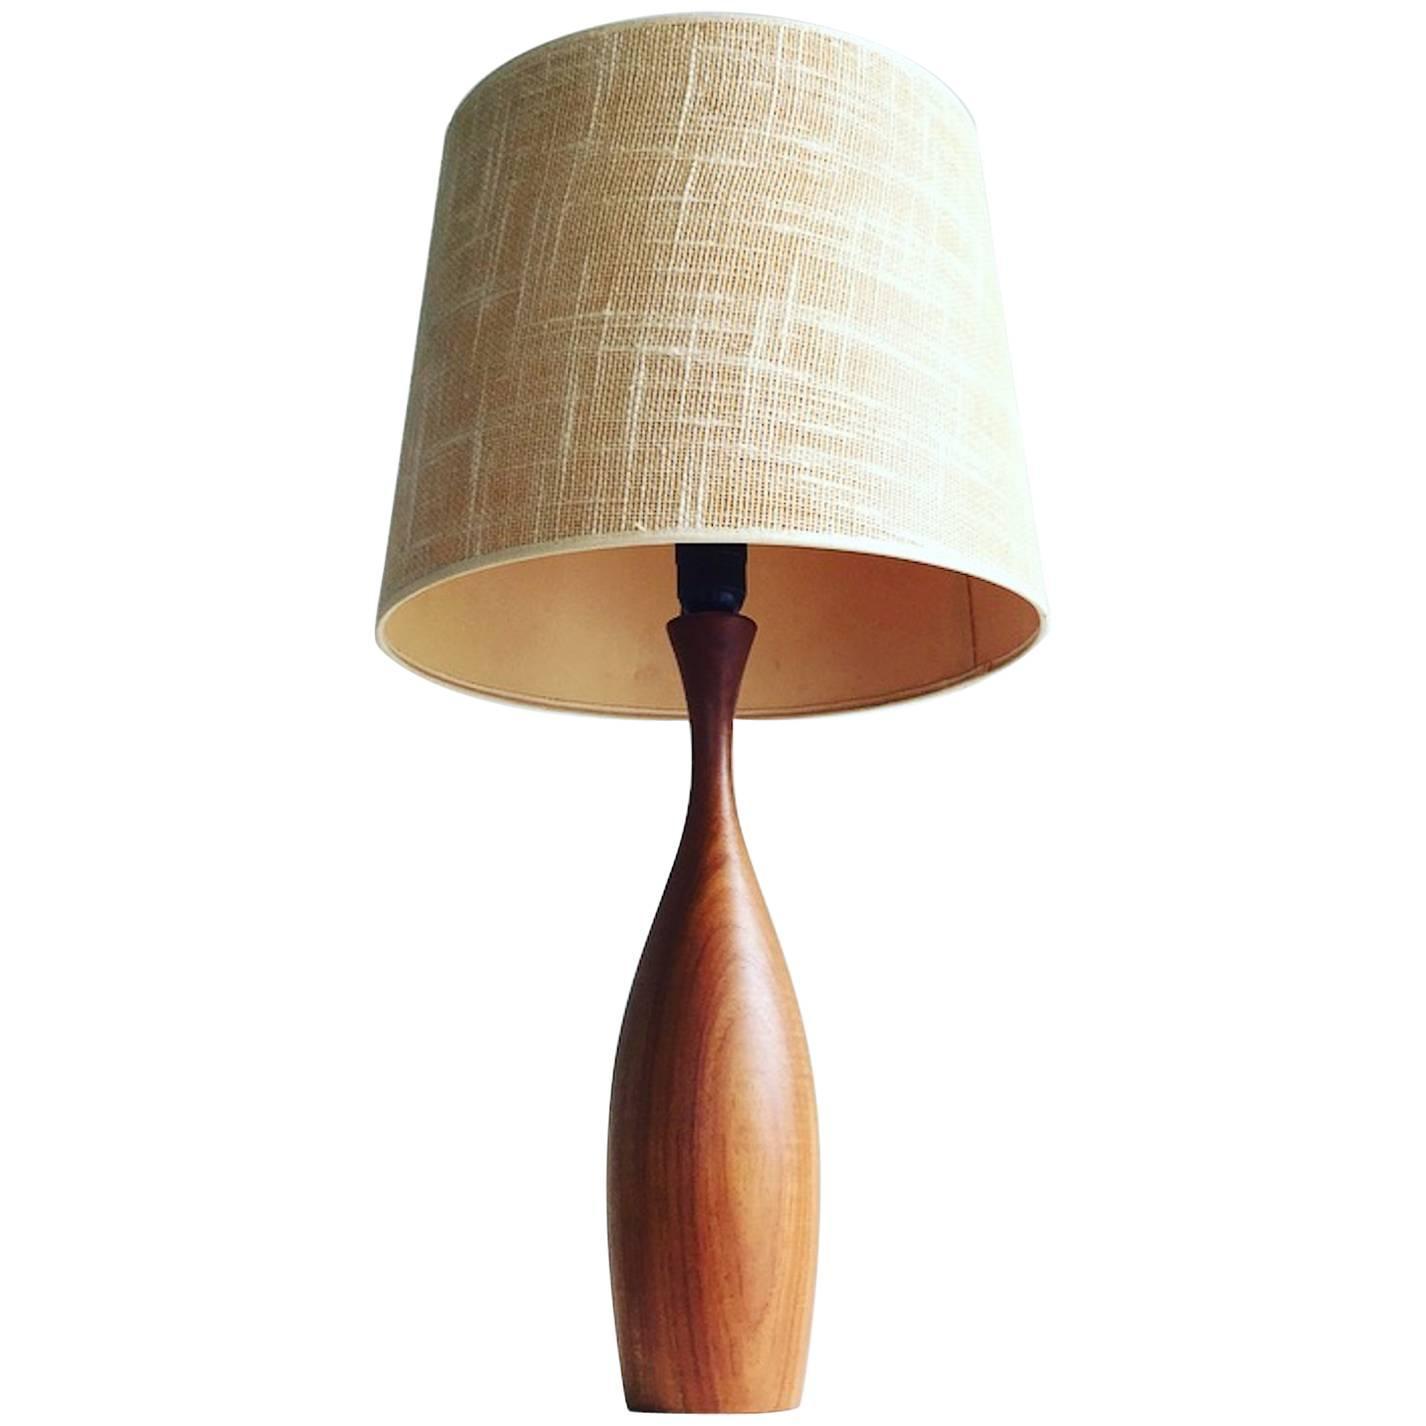 Jute Ceiling Lamp Shade: Mid-Century Danish Teak Table Lamp With Original Jute